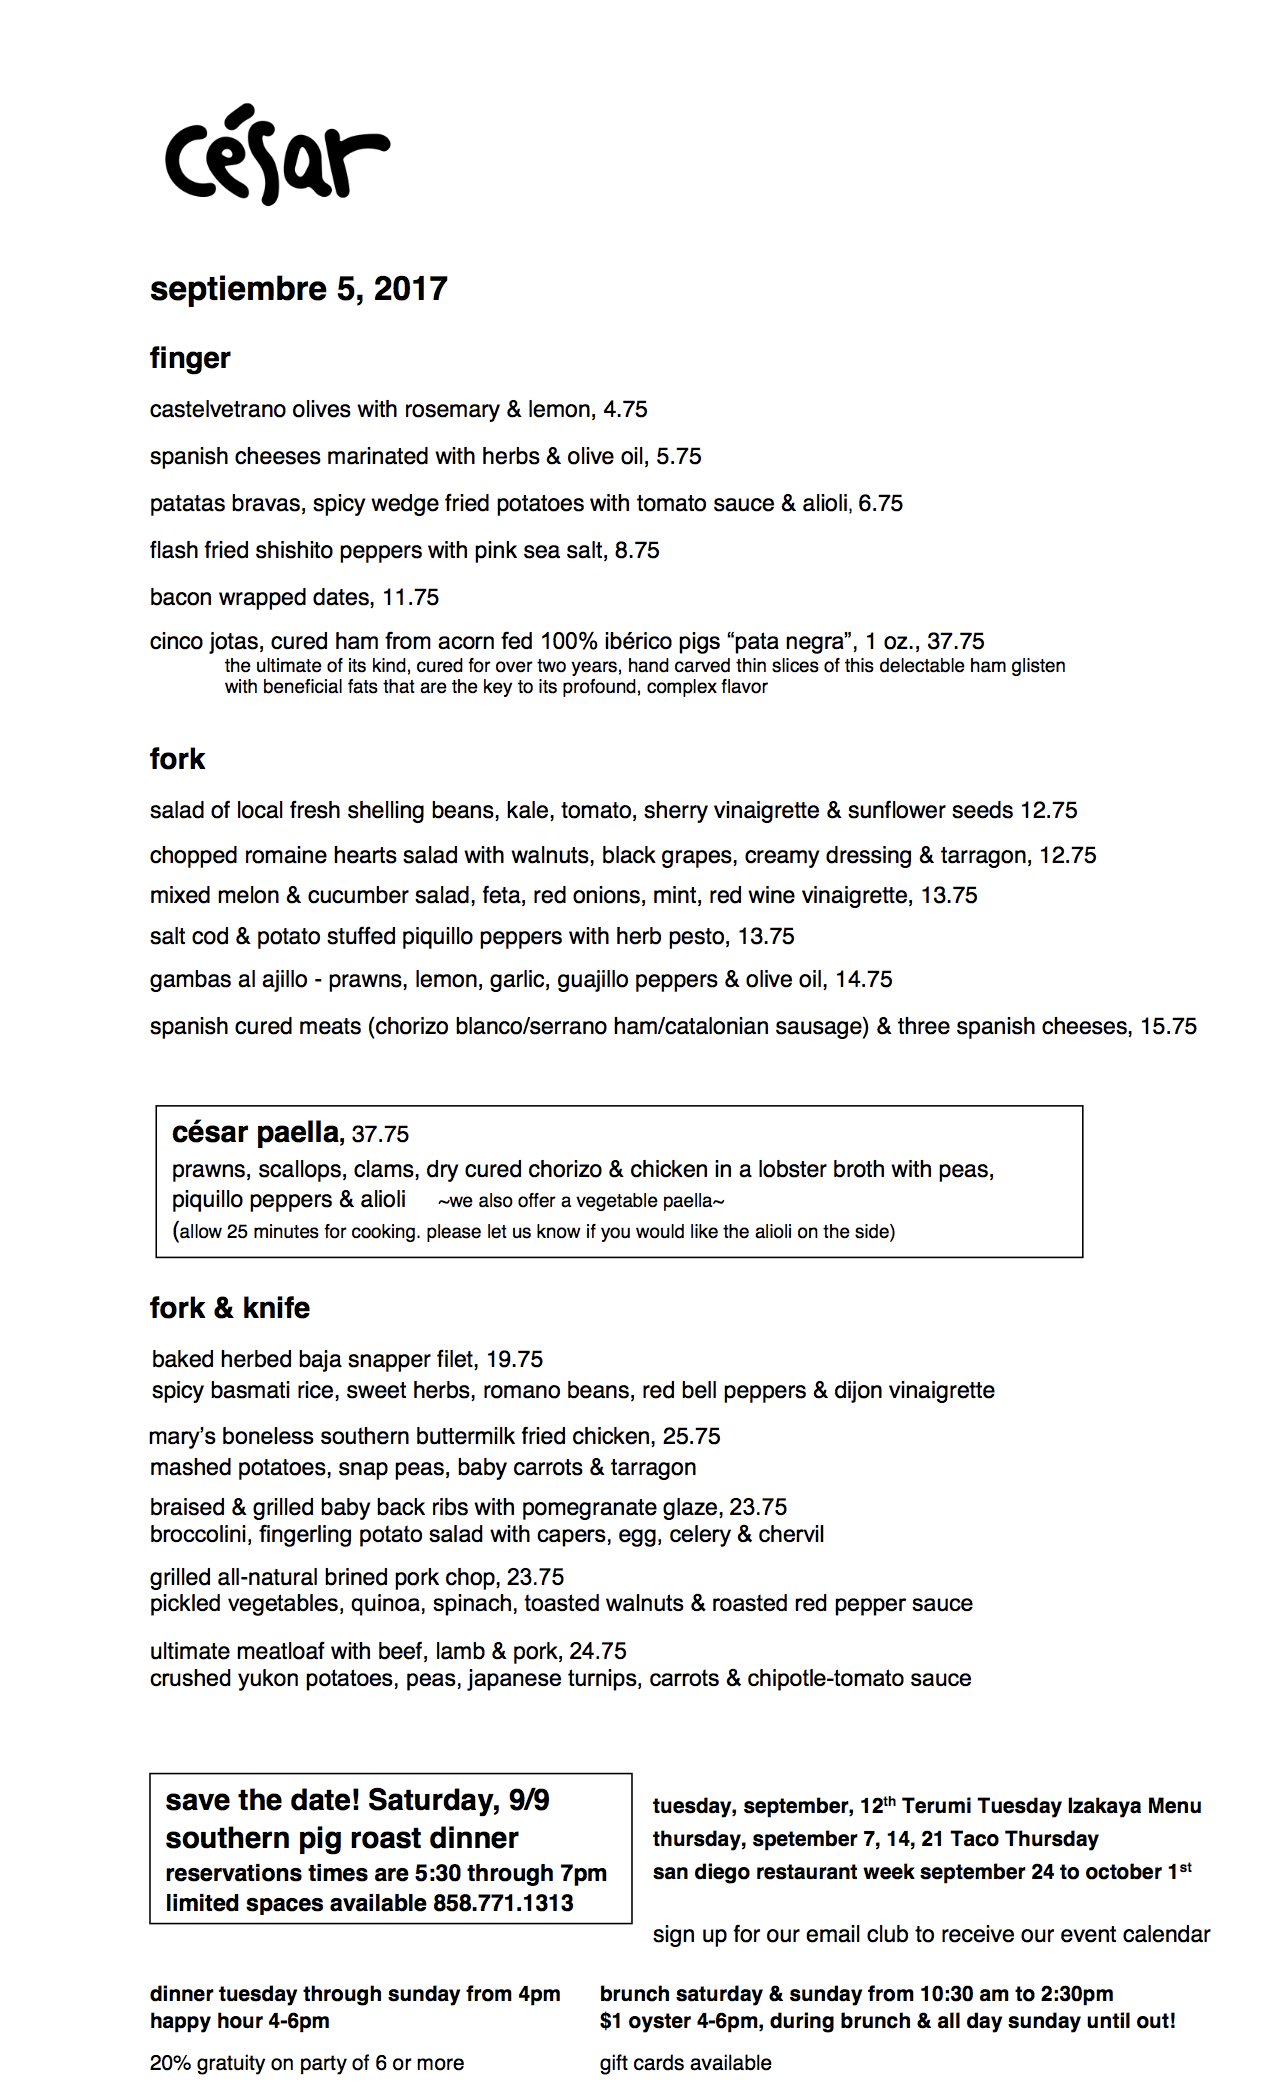 5 sep 2017 dinner menu pdf.png